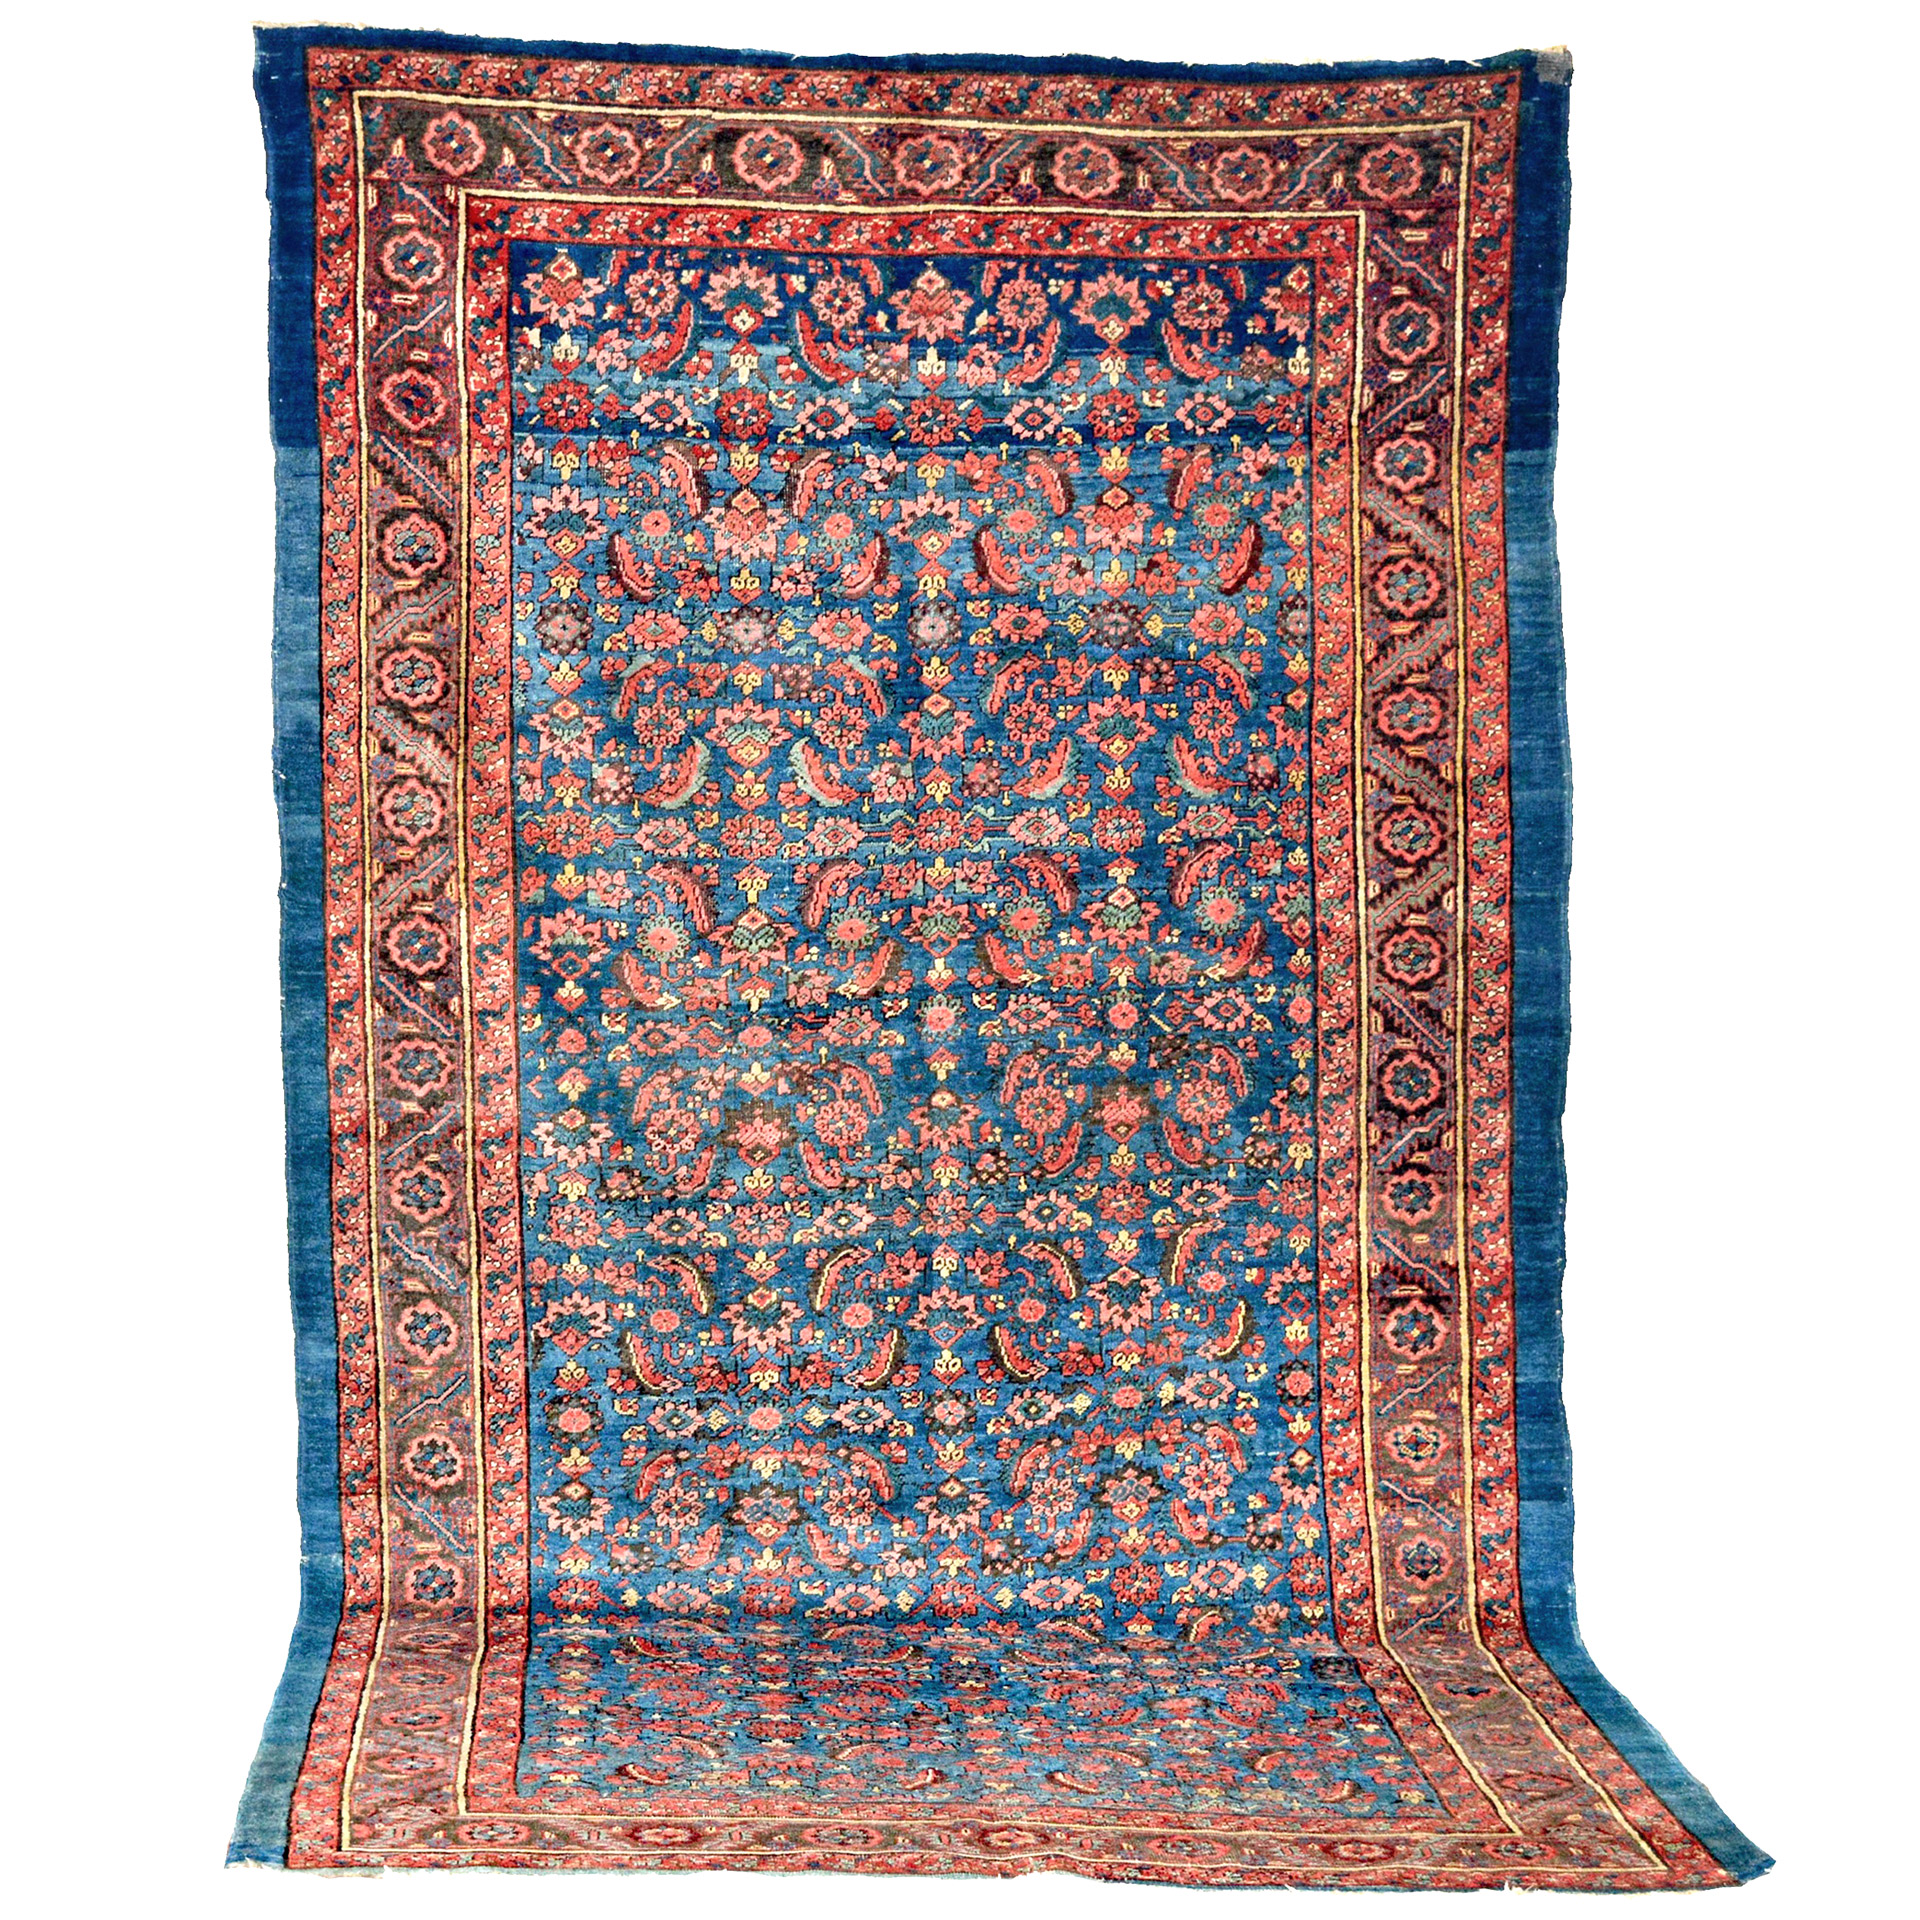 6 x 10.8 Antique Bakshaish carpet with the Herati design on a denim blue field